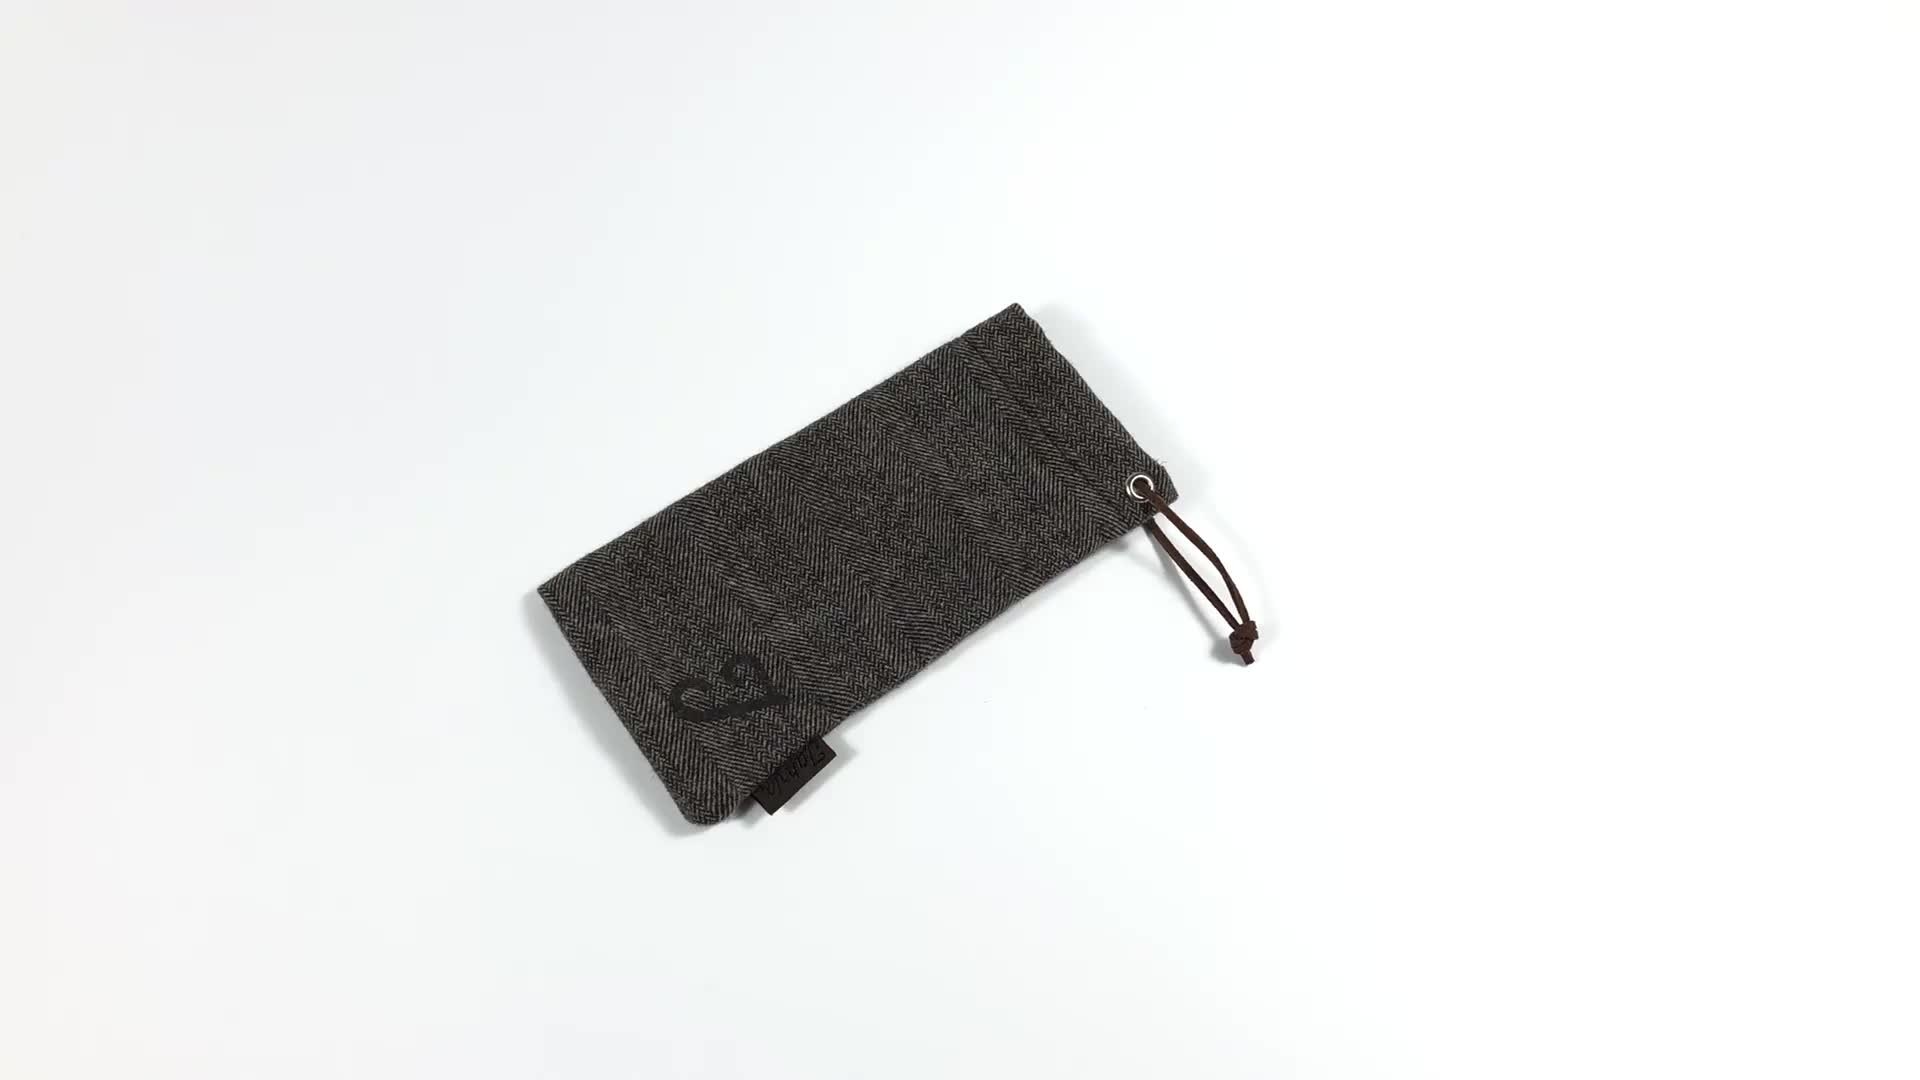 Custom Logo Cotton Sunglasses Pouch Bag Case Flap Soft Leather Pu Microfiber Sunglasses Cloth Pouch For Sunglasses Pouch